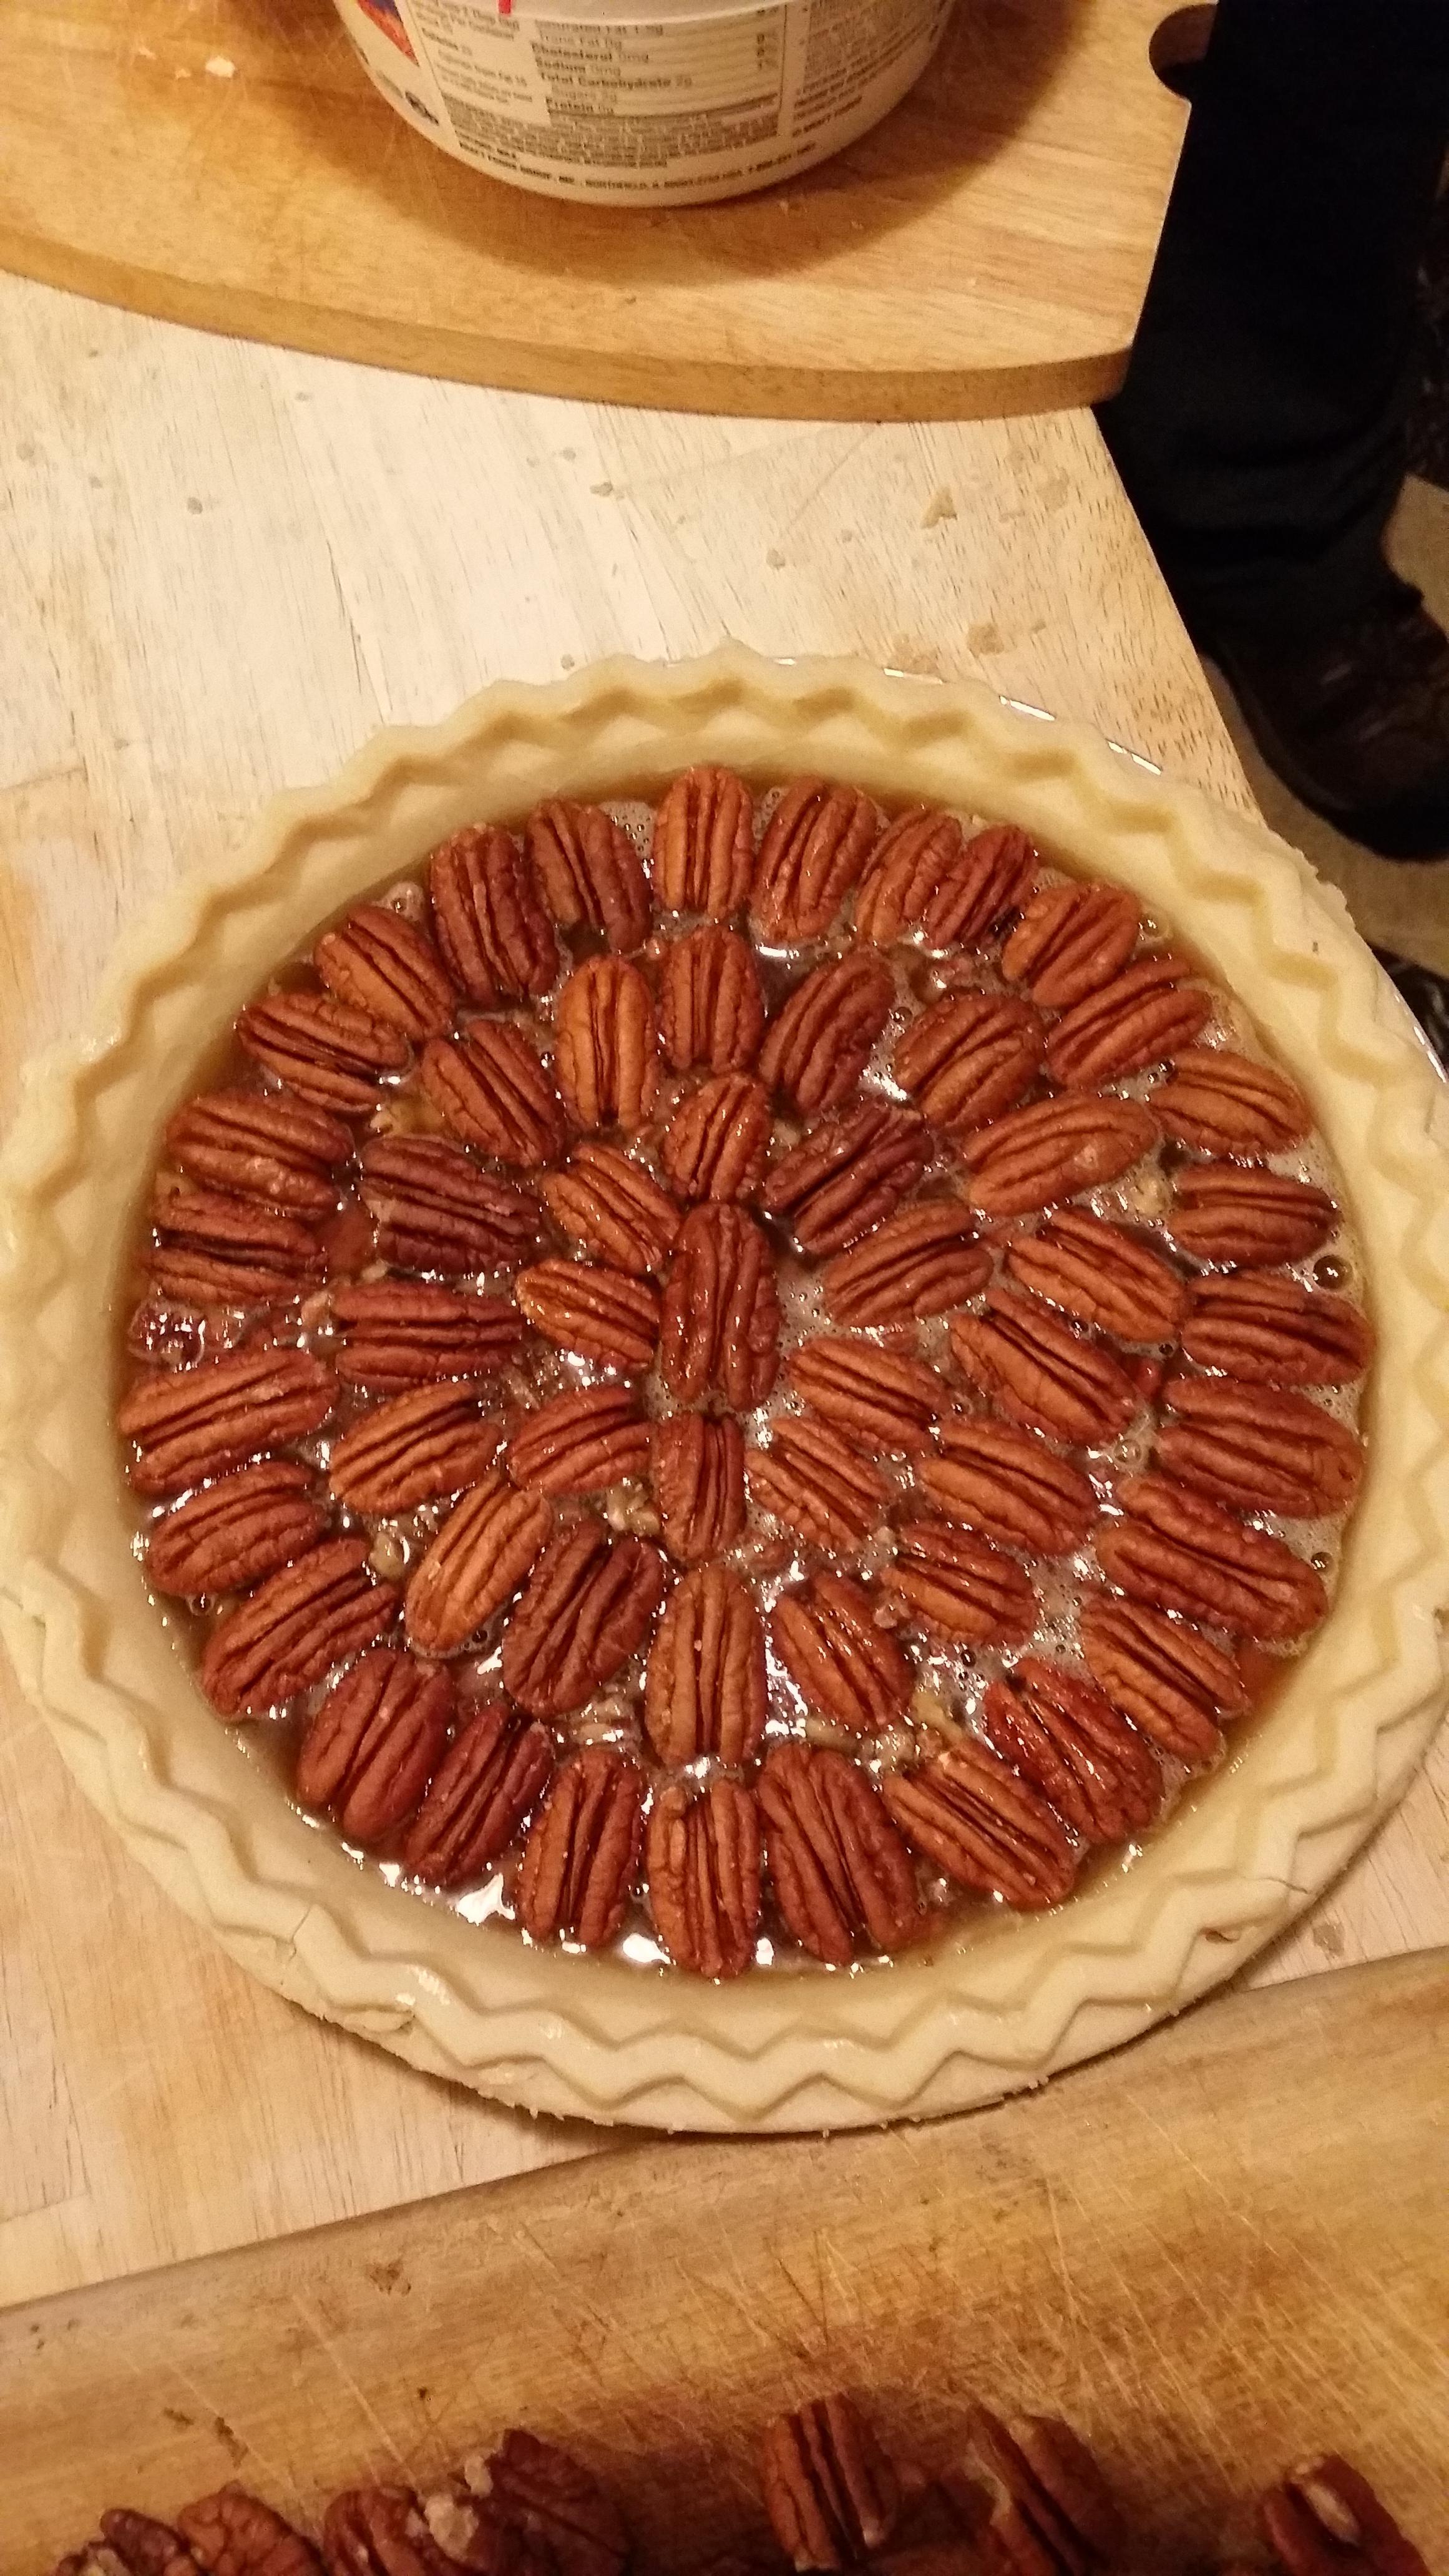 images irresistible pecan pie irresistible pecan pie make chocolate ...